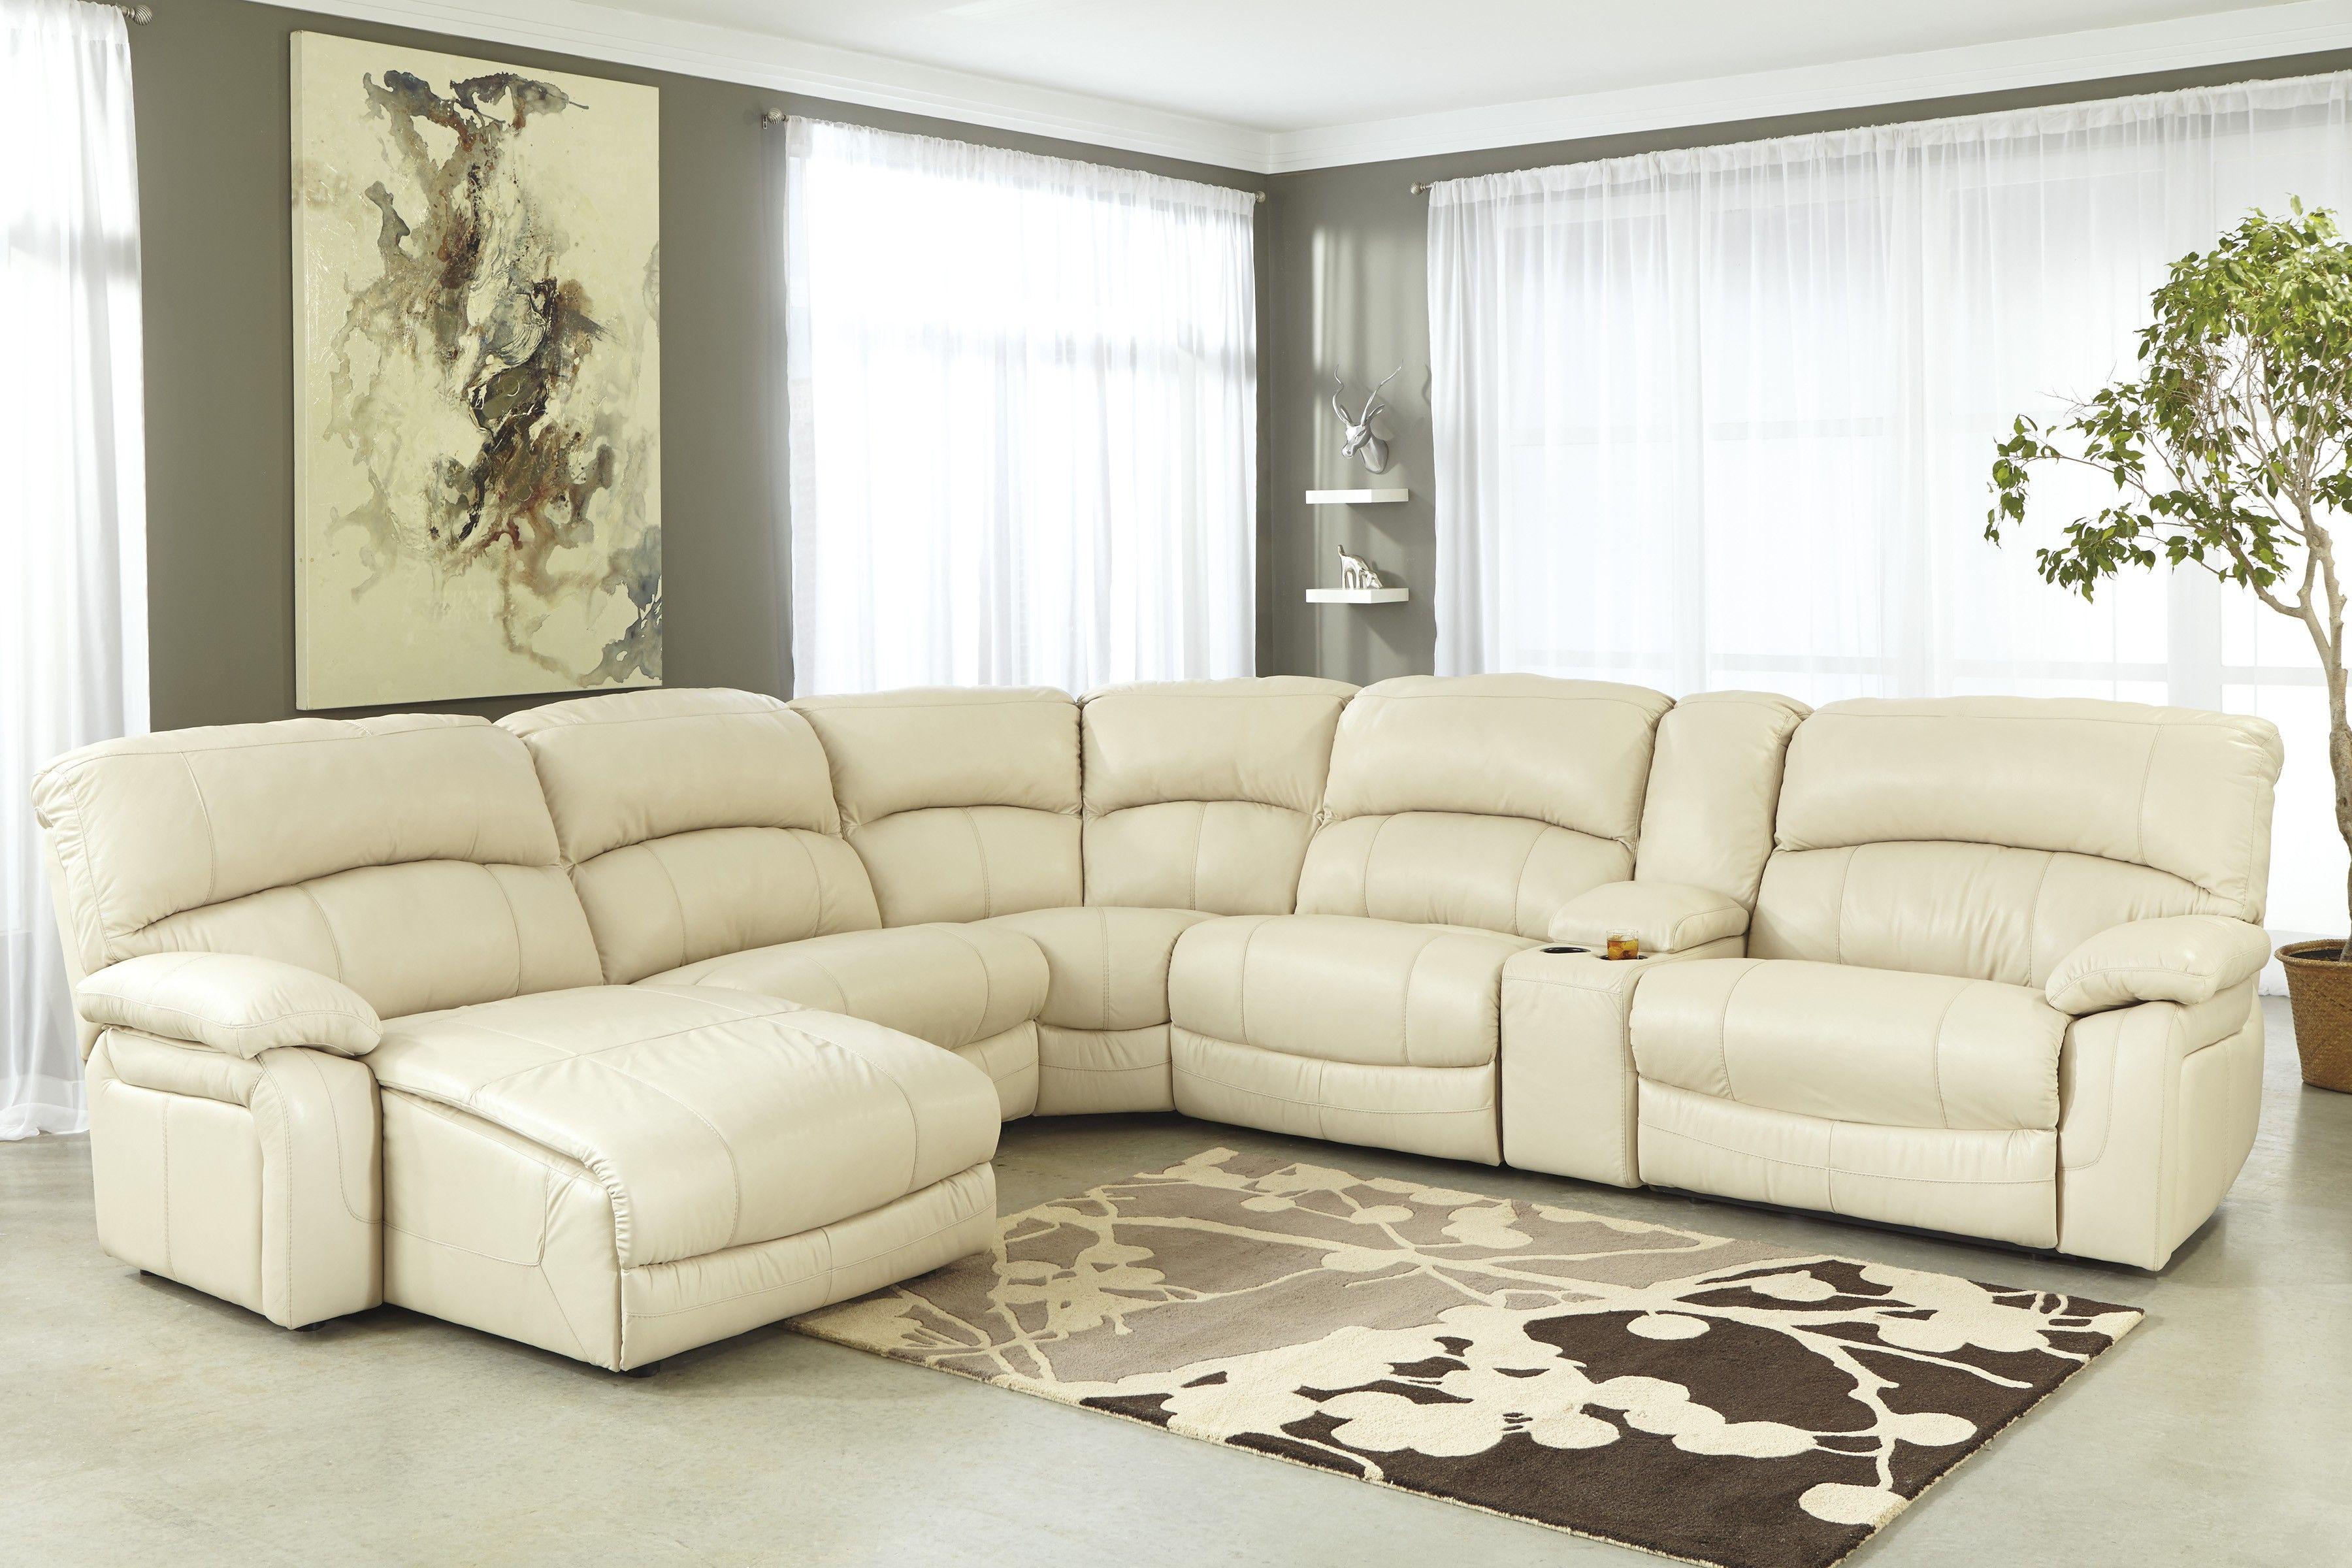 Damacio Sofa White Leather Couch Living Room White Cream Leather Sofa